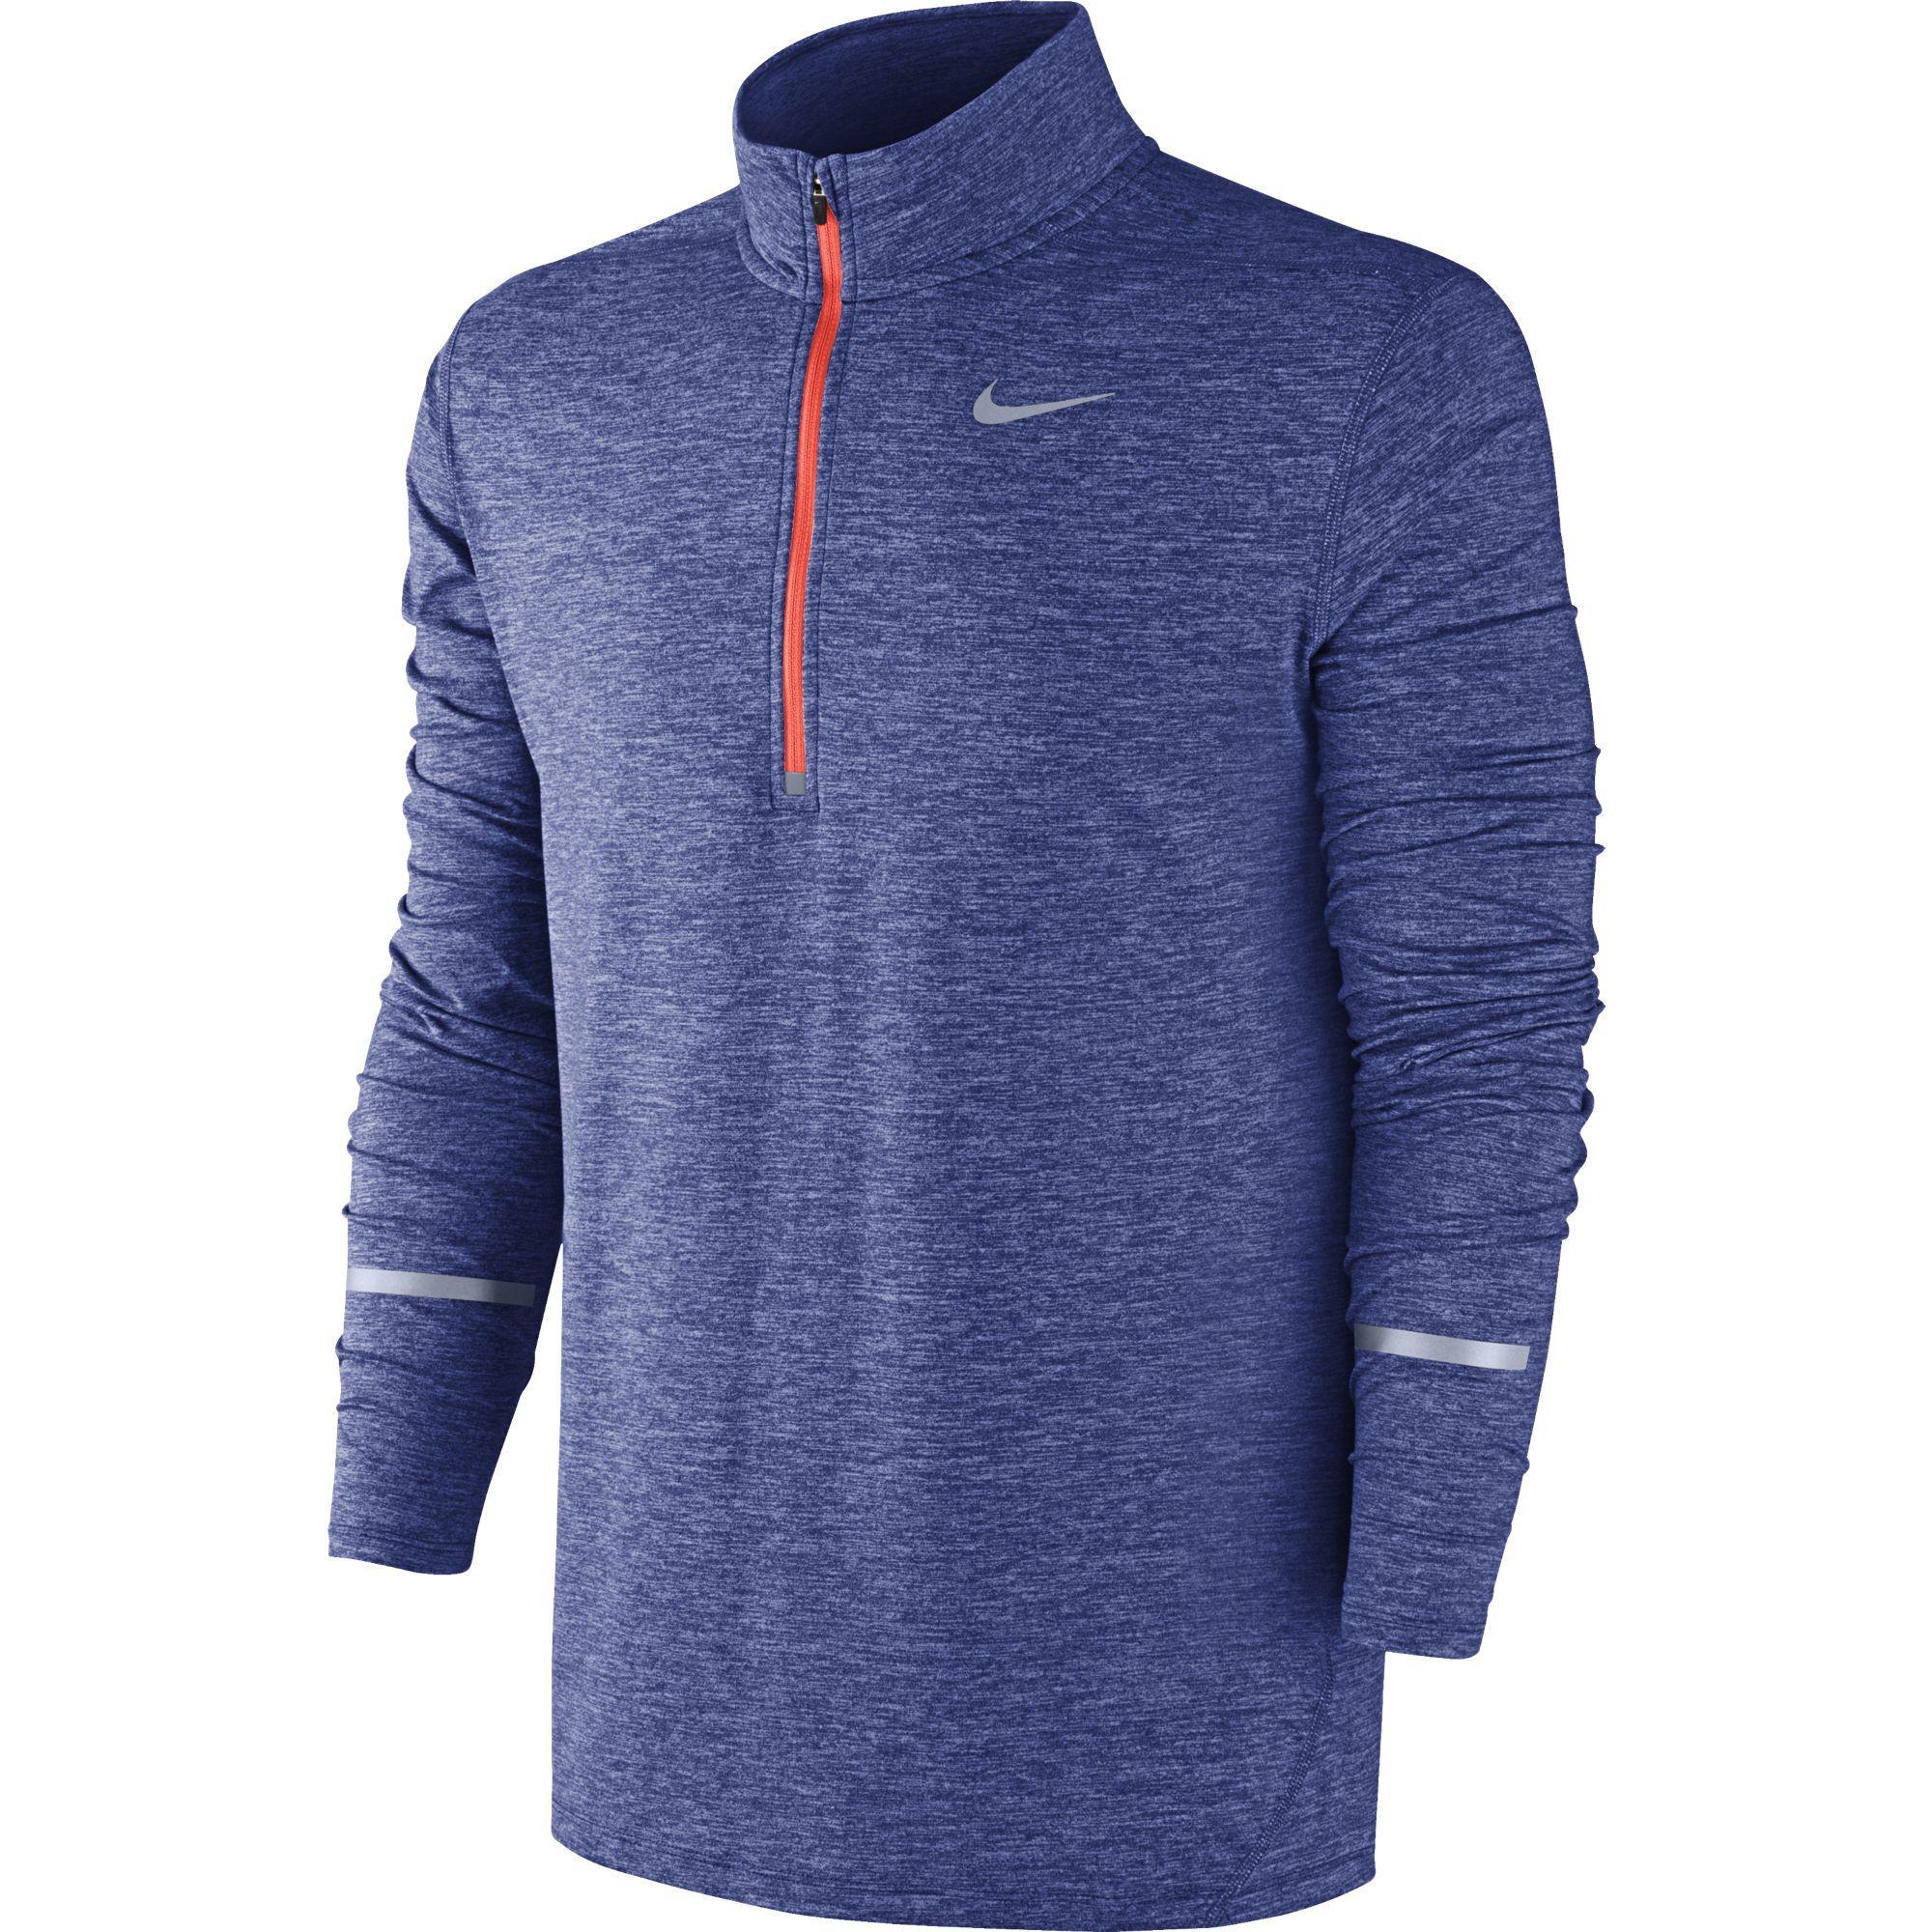 b6094a2181ffd Nike Mens Dri-FIT Element Half-Zip Top - Deep Royal Blue